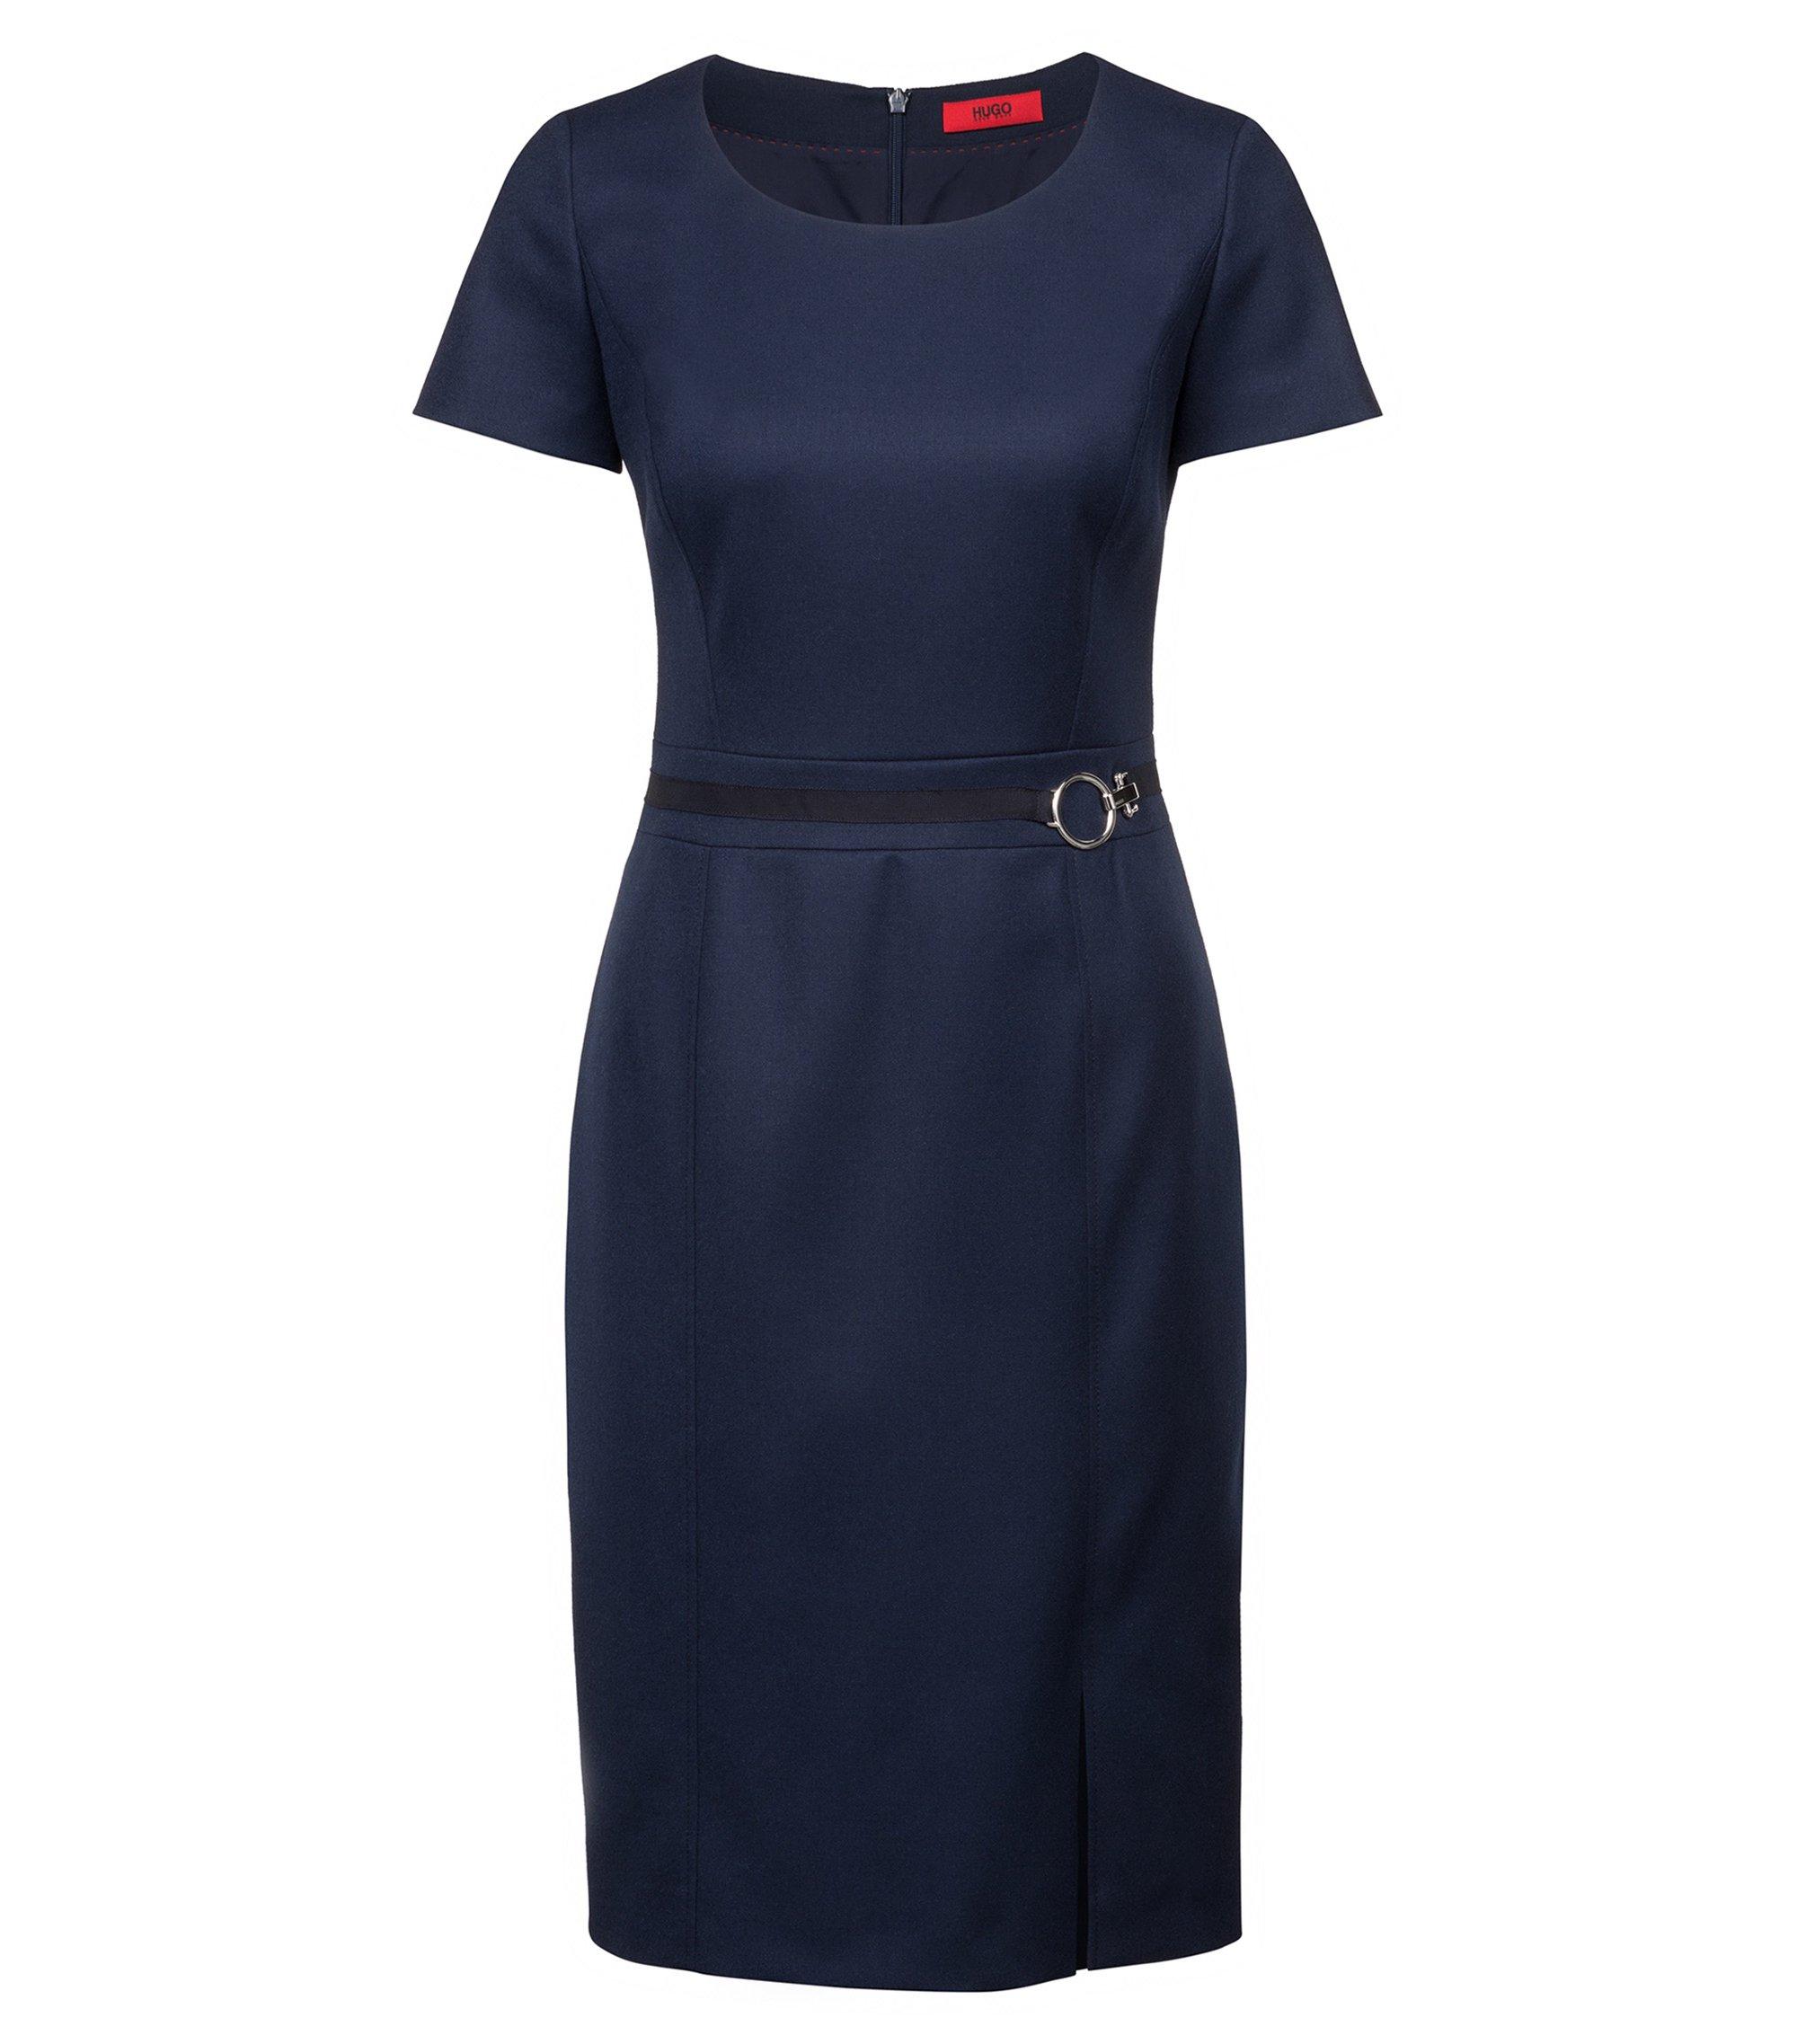 Shiftdress met korte mouwen en logogesp, Donkerblauw